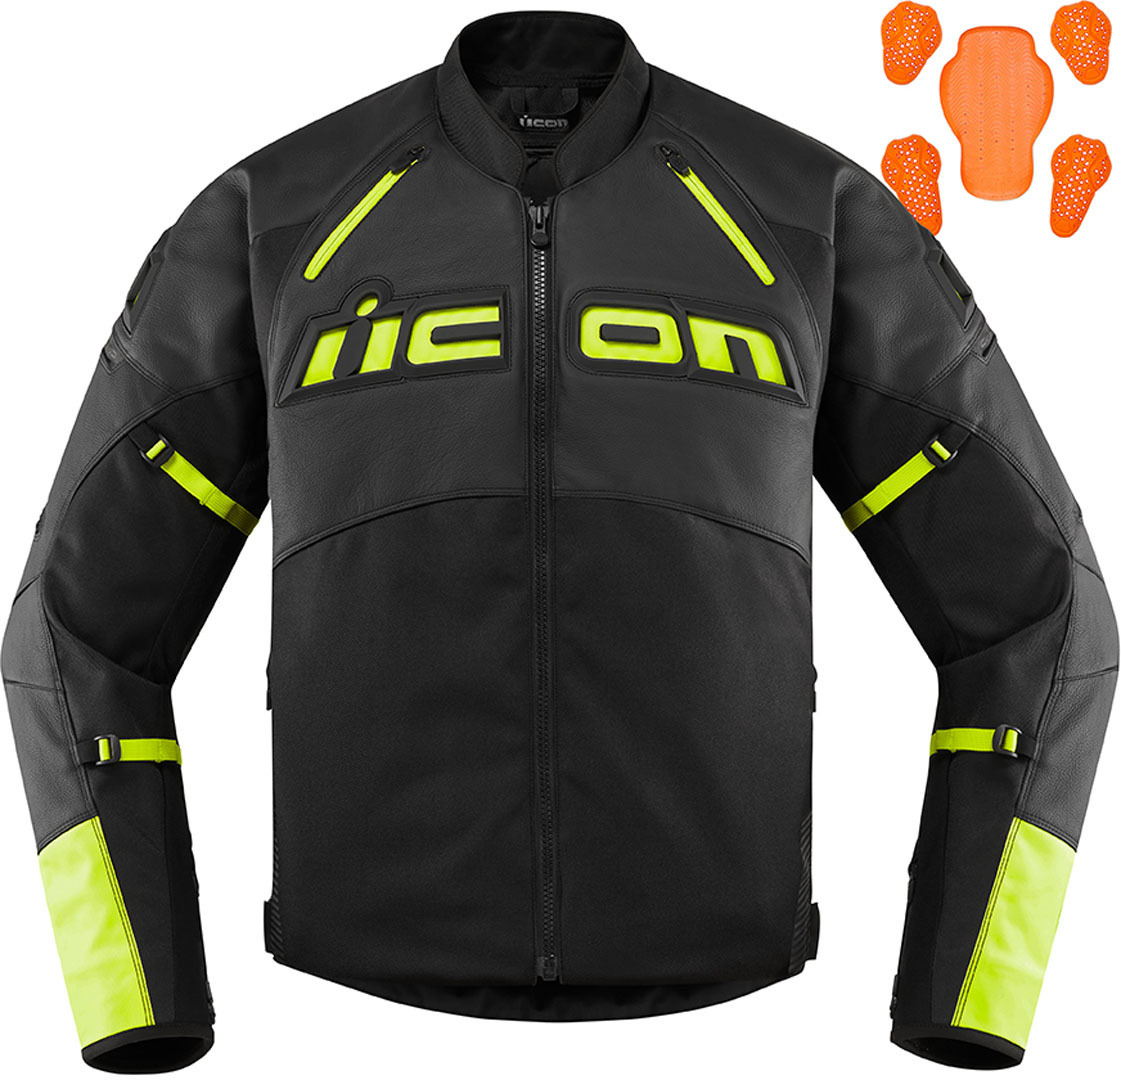 Icon Contra2 Motorrad Textil- / Lederjacke, schwarz-gelb, Größe 2XL, schwarz-gelb, Größe 2XL